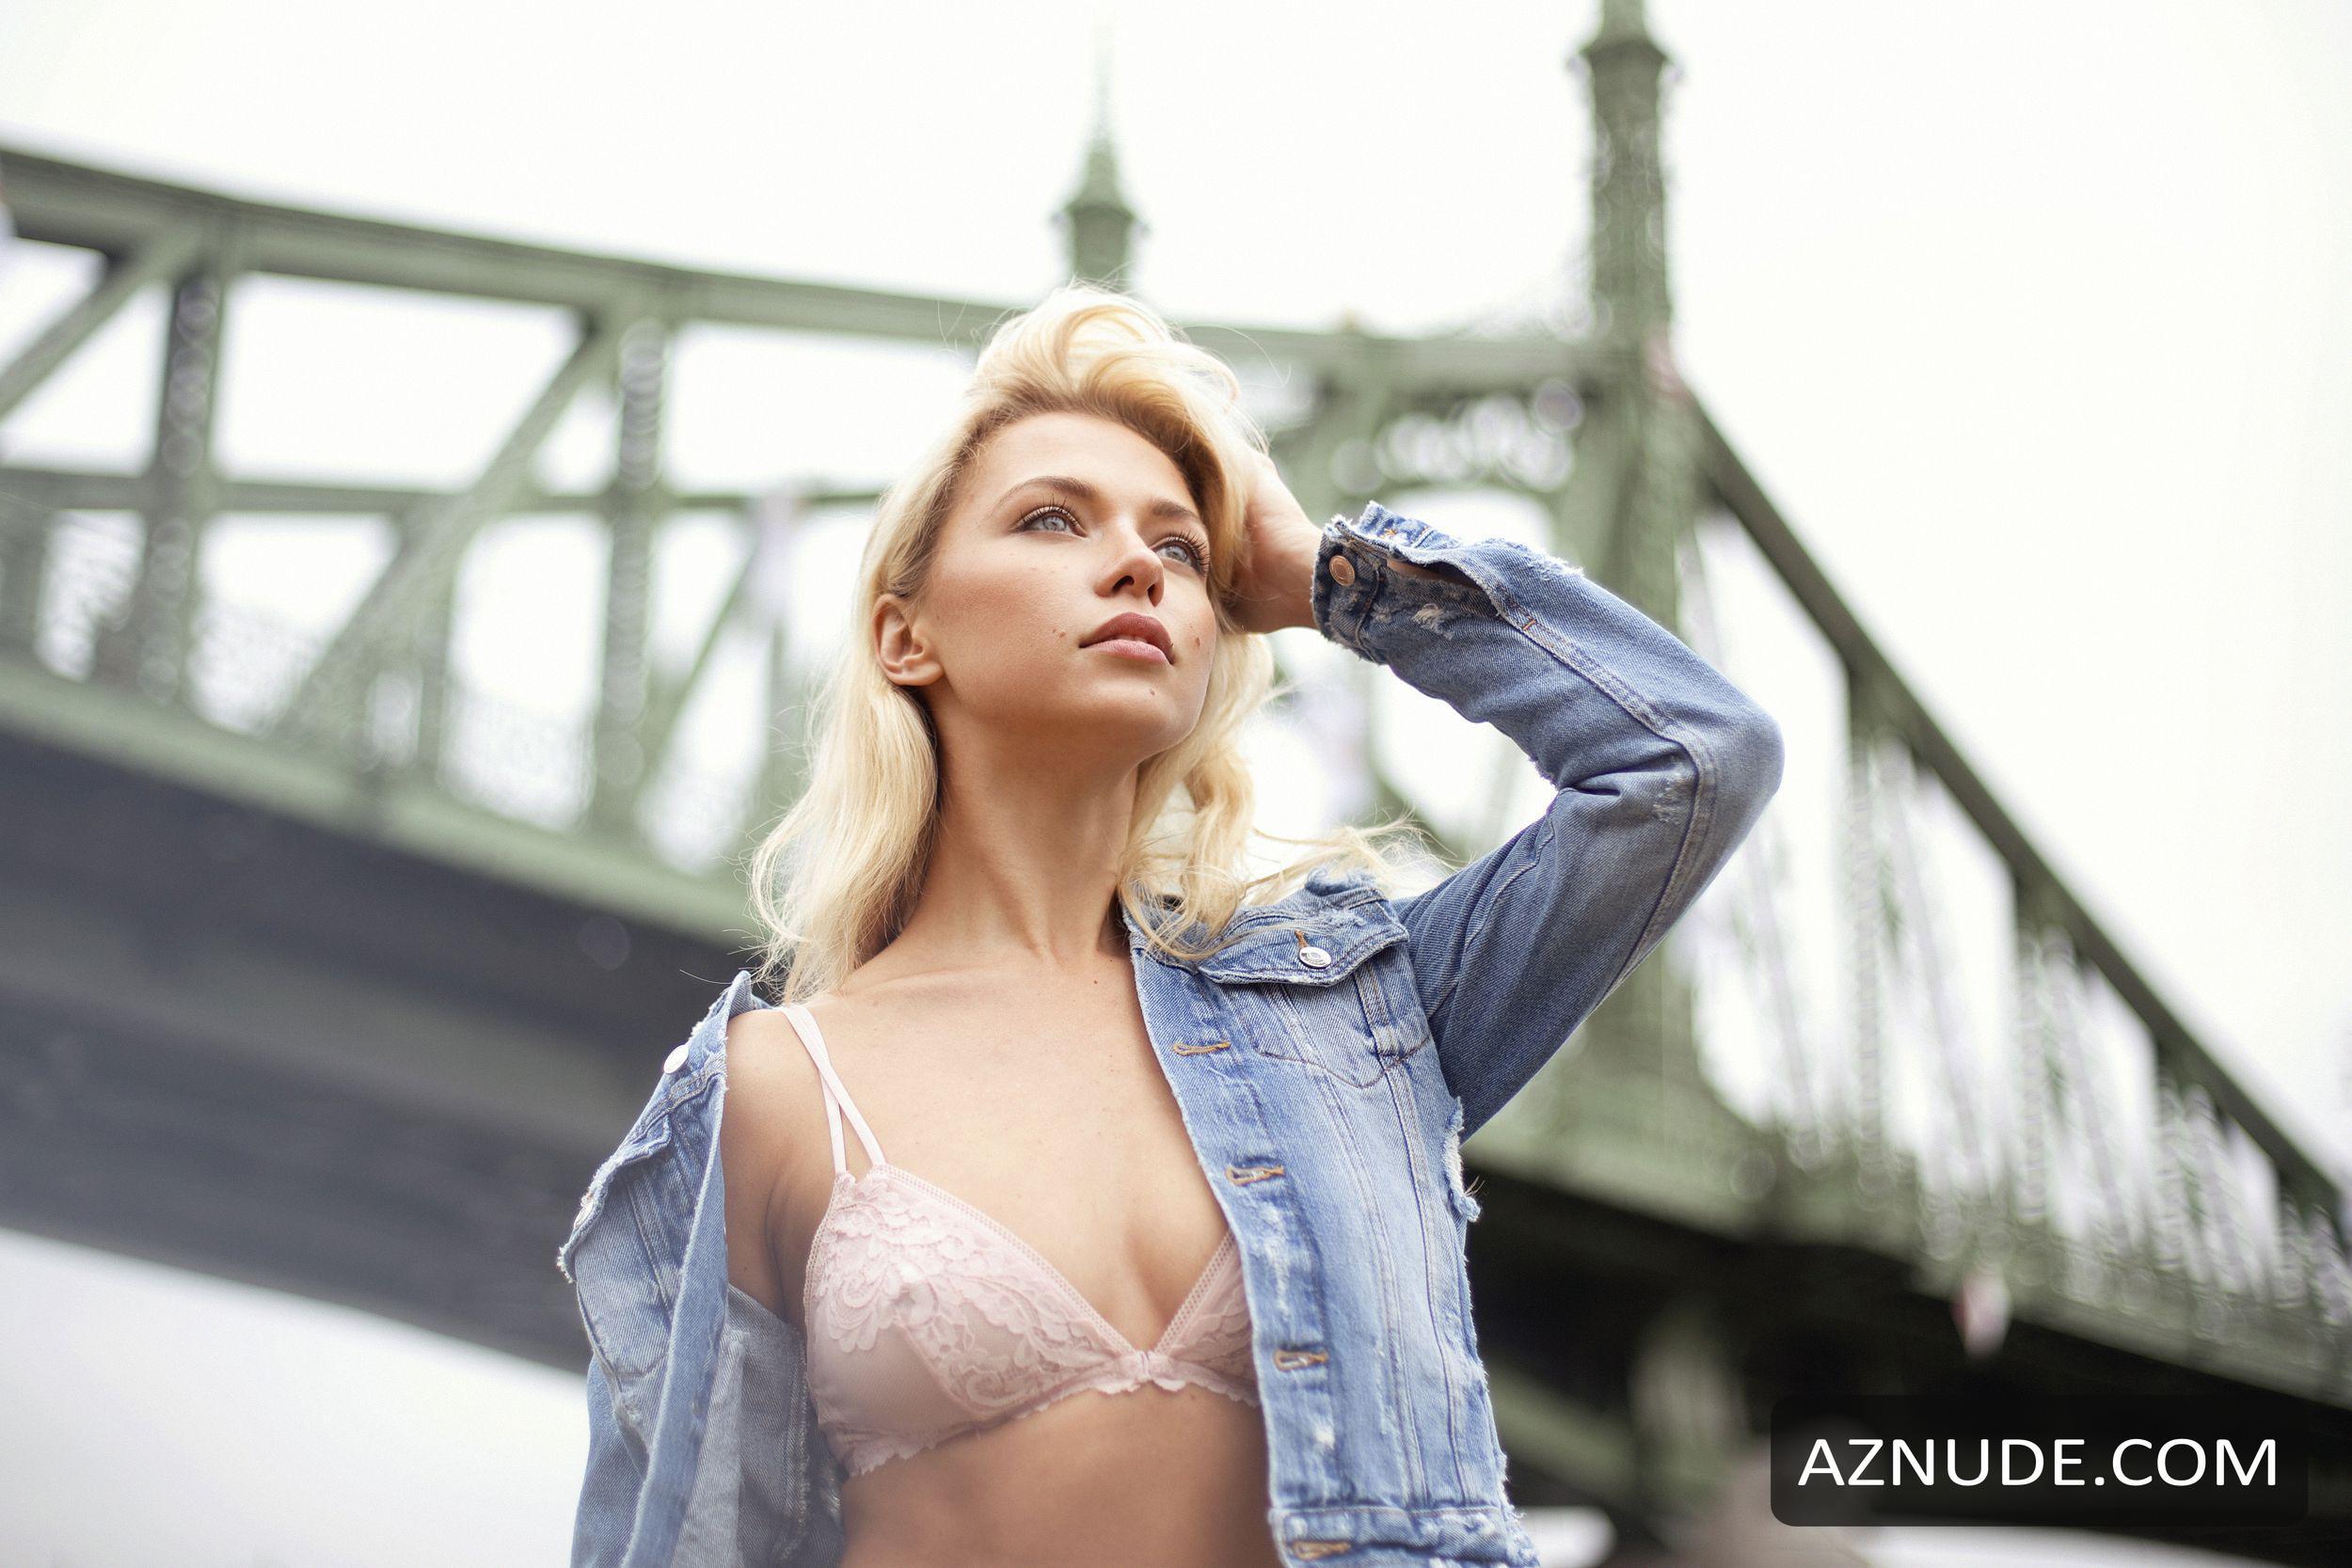 Kristina boyko nude new photo